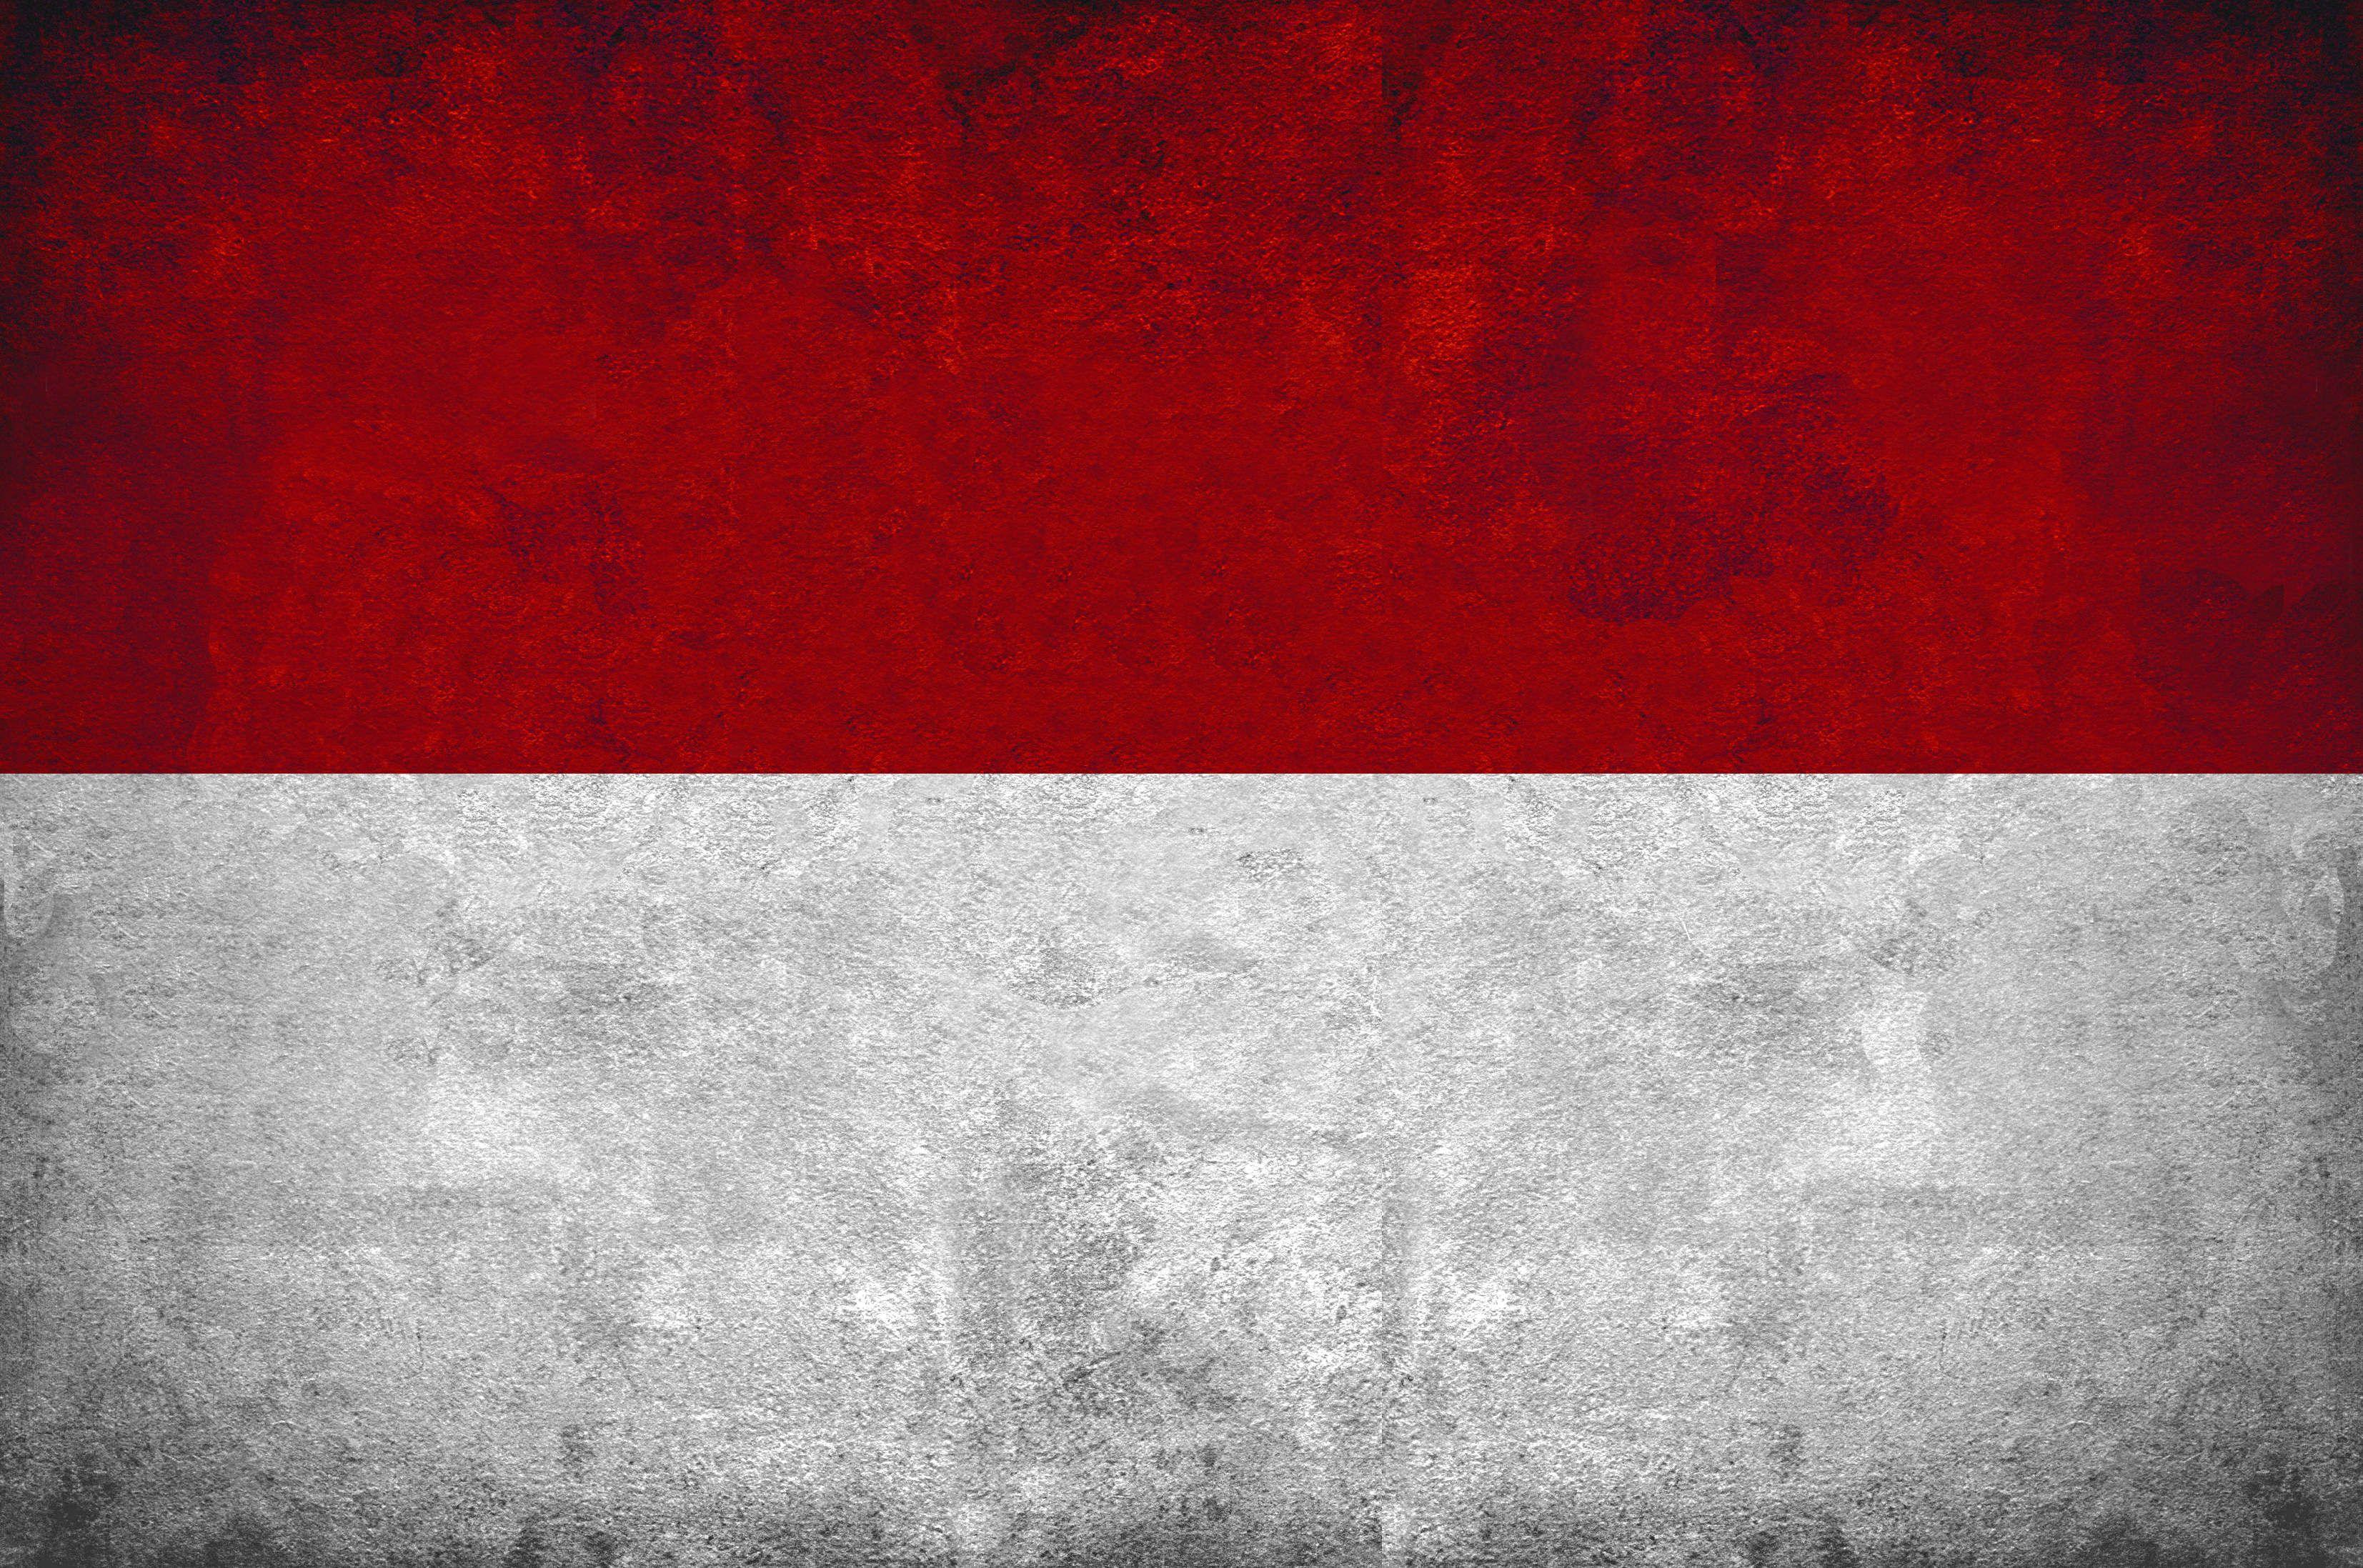 INDONESIA FLAG | ○ INDONESIA... | Pinterest | Indonesia flag and ...